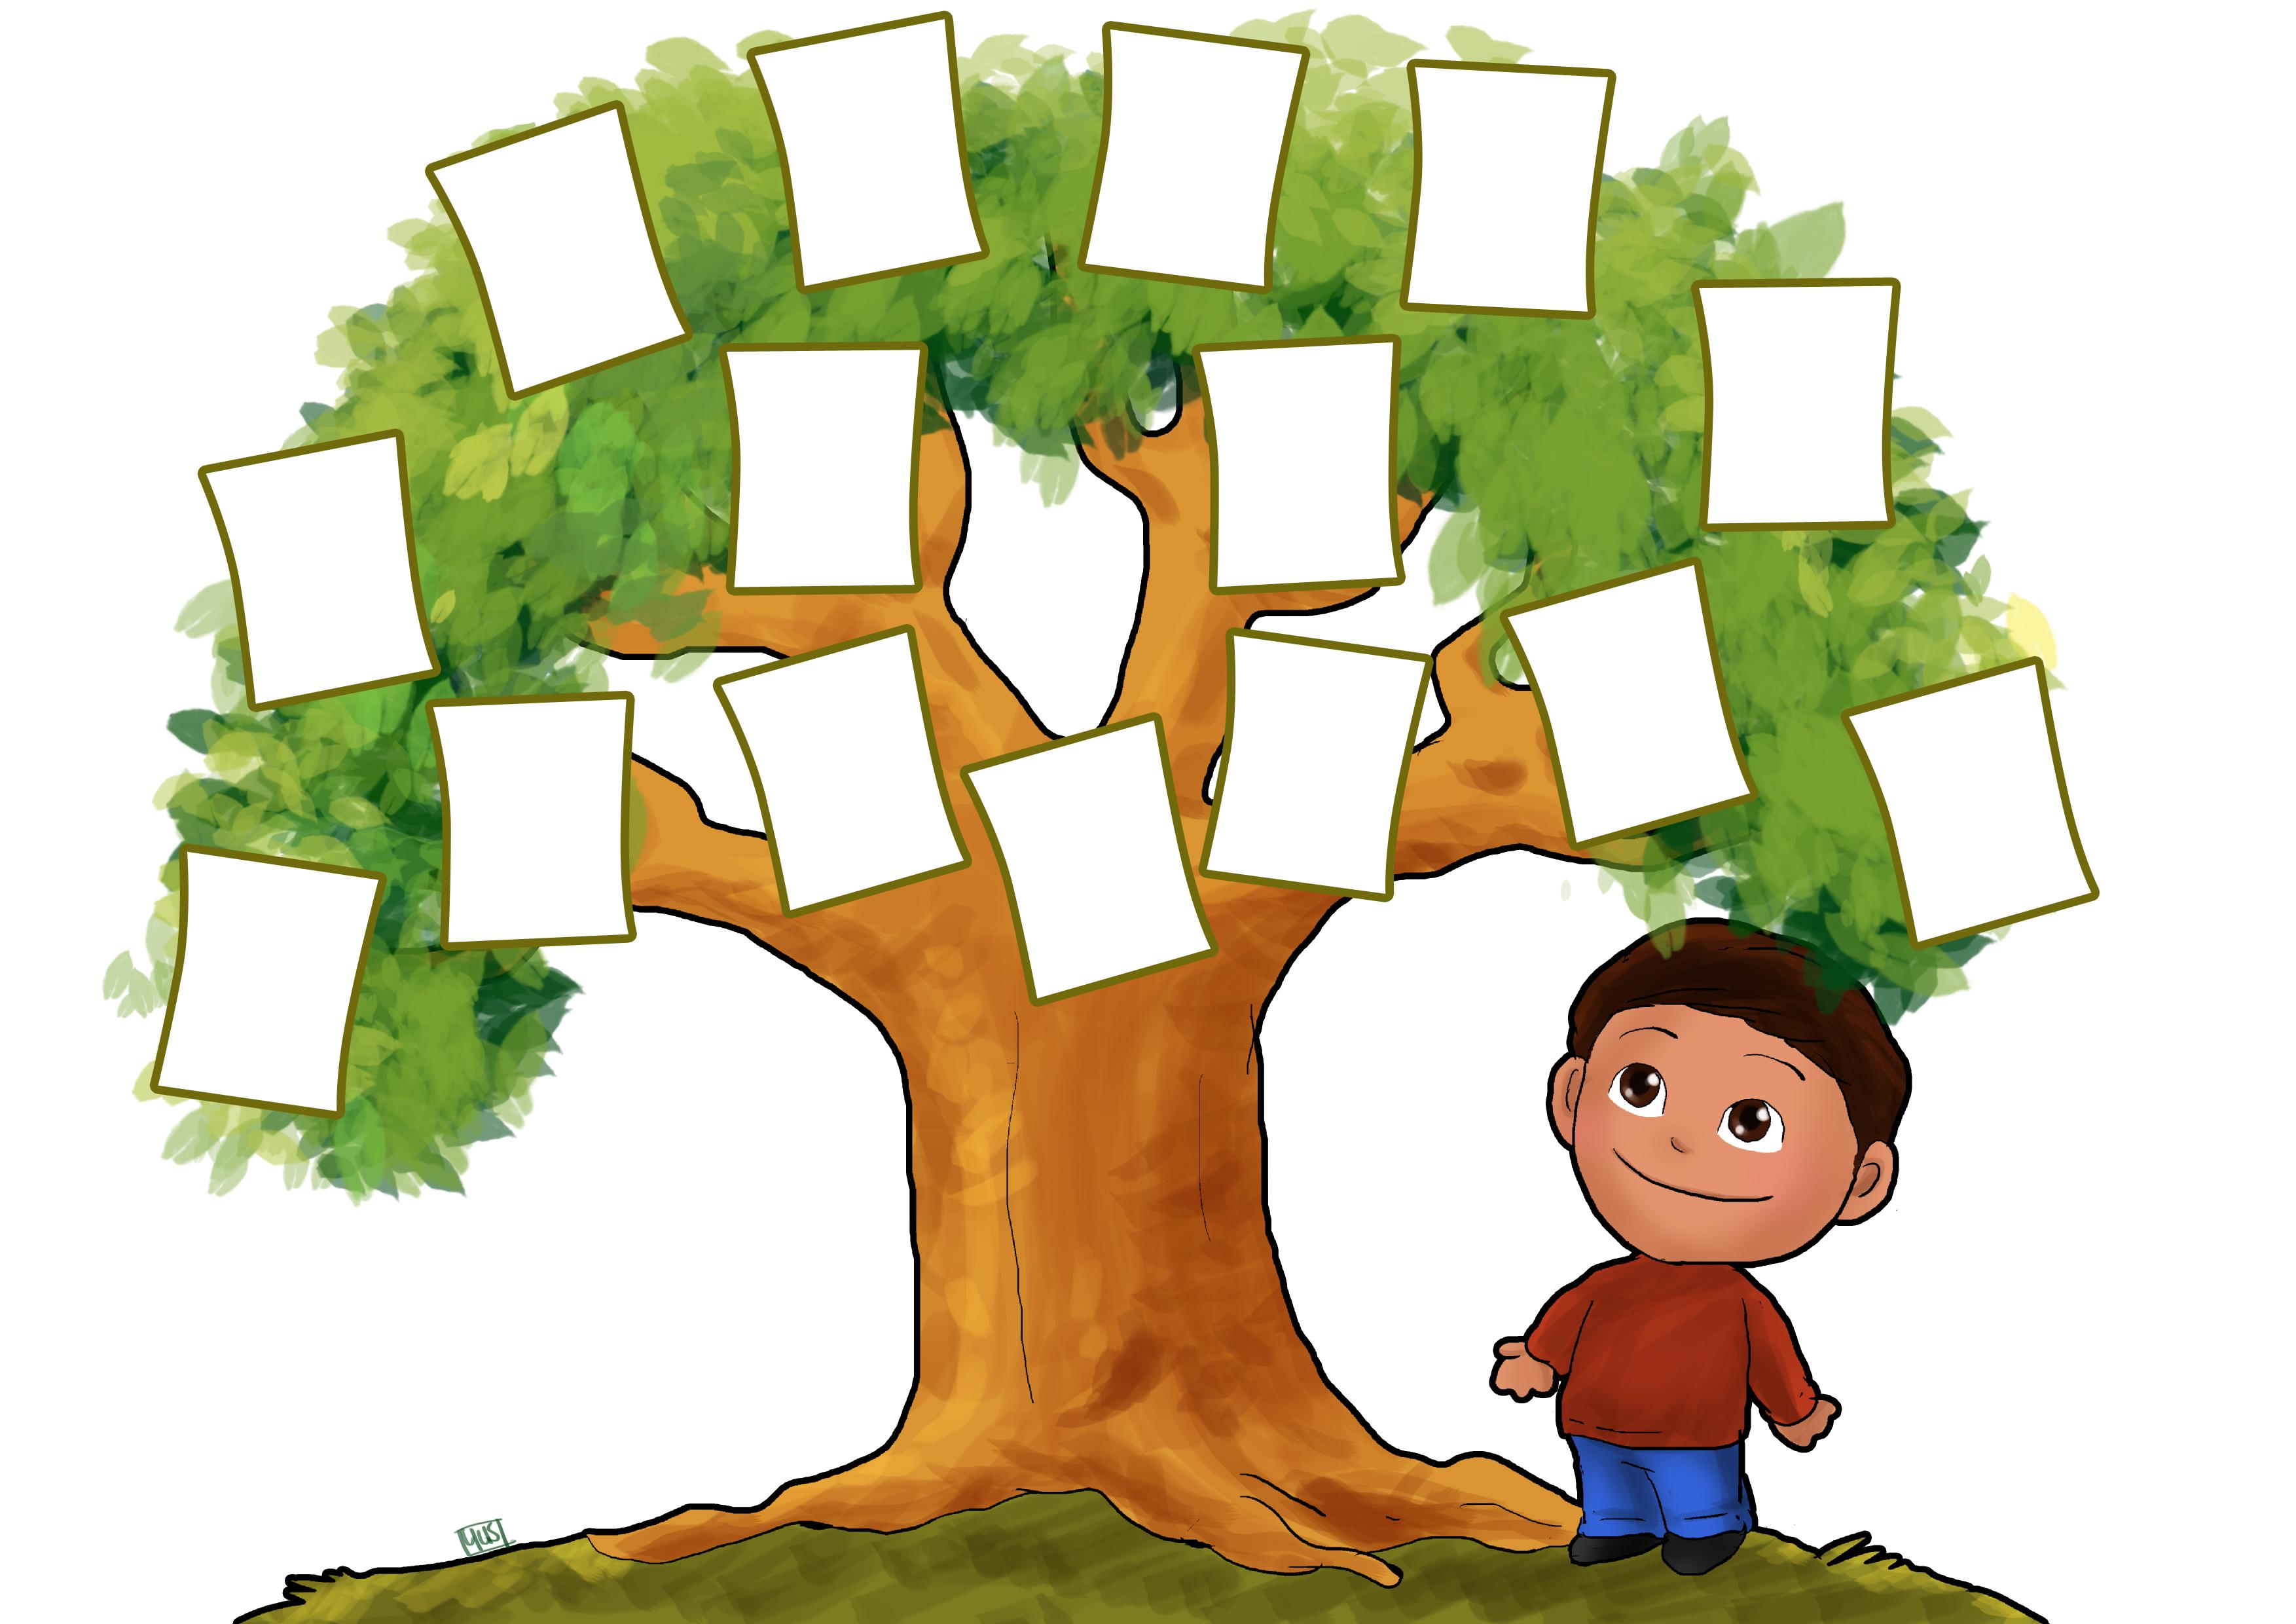 Ancestors clipart picture freeuse download Free Family Tree Cliparts, Download Free Clip Art, Free Clip Art on ... picture freeuse download